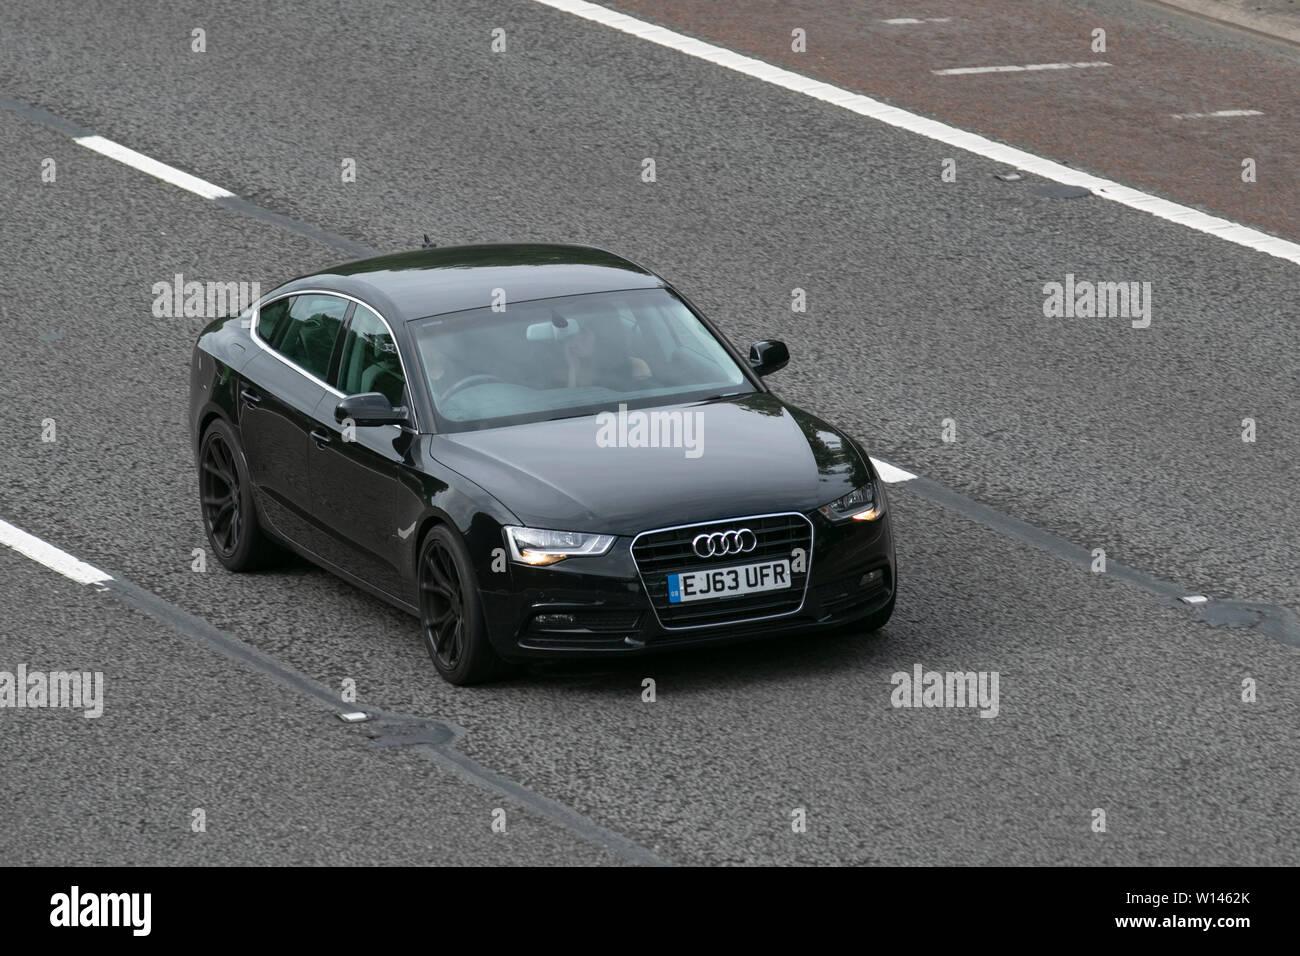 2013 black Audi A5 SE Technik TDI; M6, Lancaster, UK; Vehicular traffic, transport, modern, saloon cars, north-bound on the 3 lane highway. - Stock Image